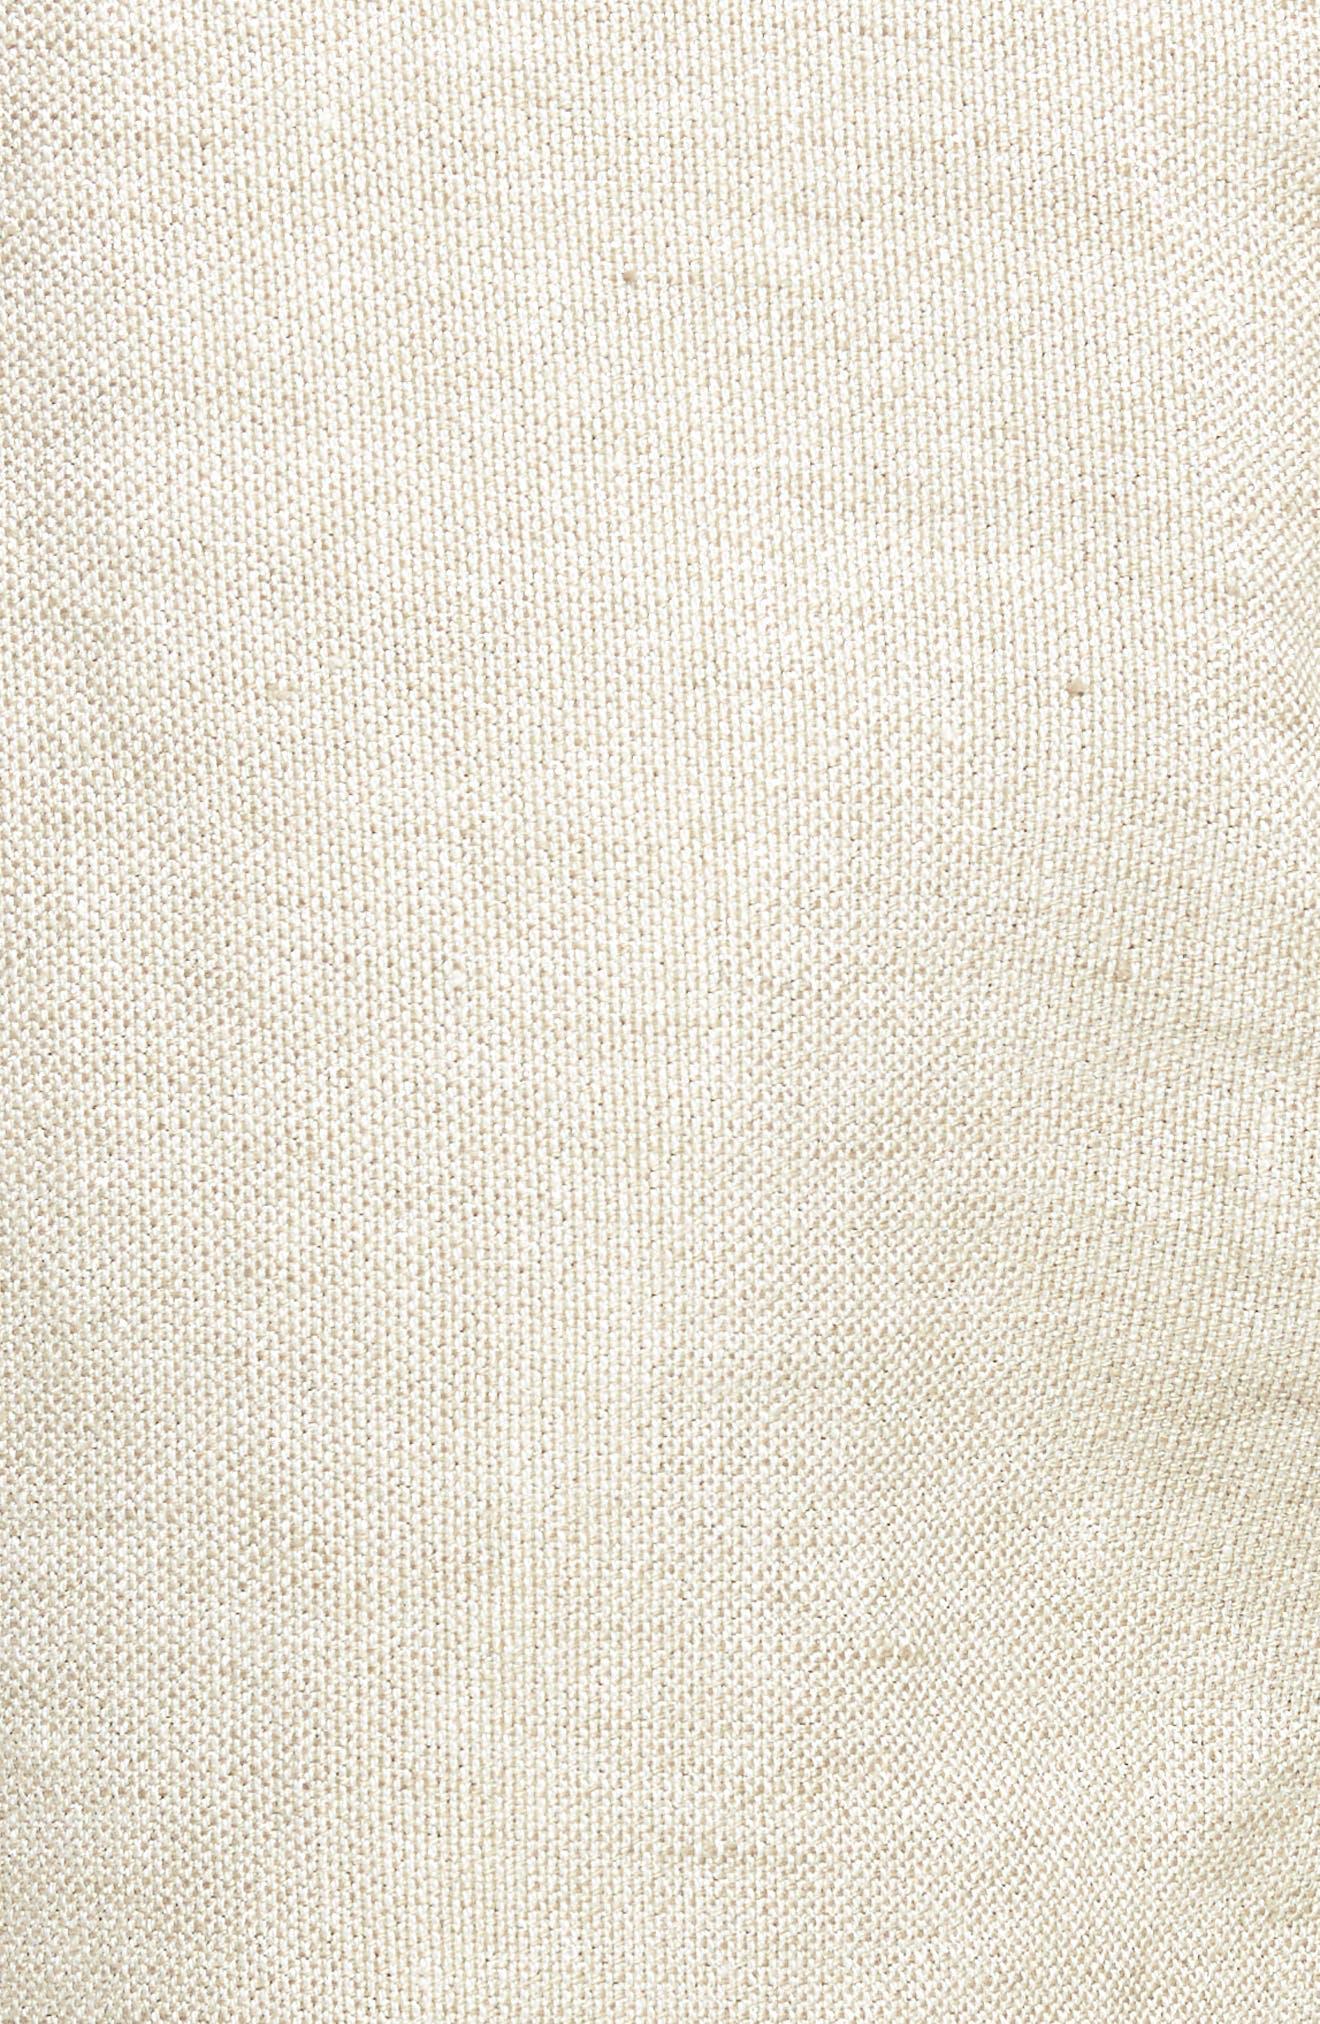 Organic Linen Blend Walking Shorts,                             Alternate thumbnail 5, color,